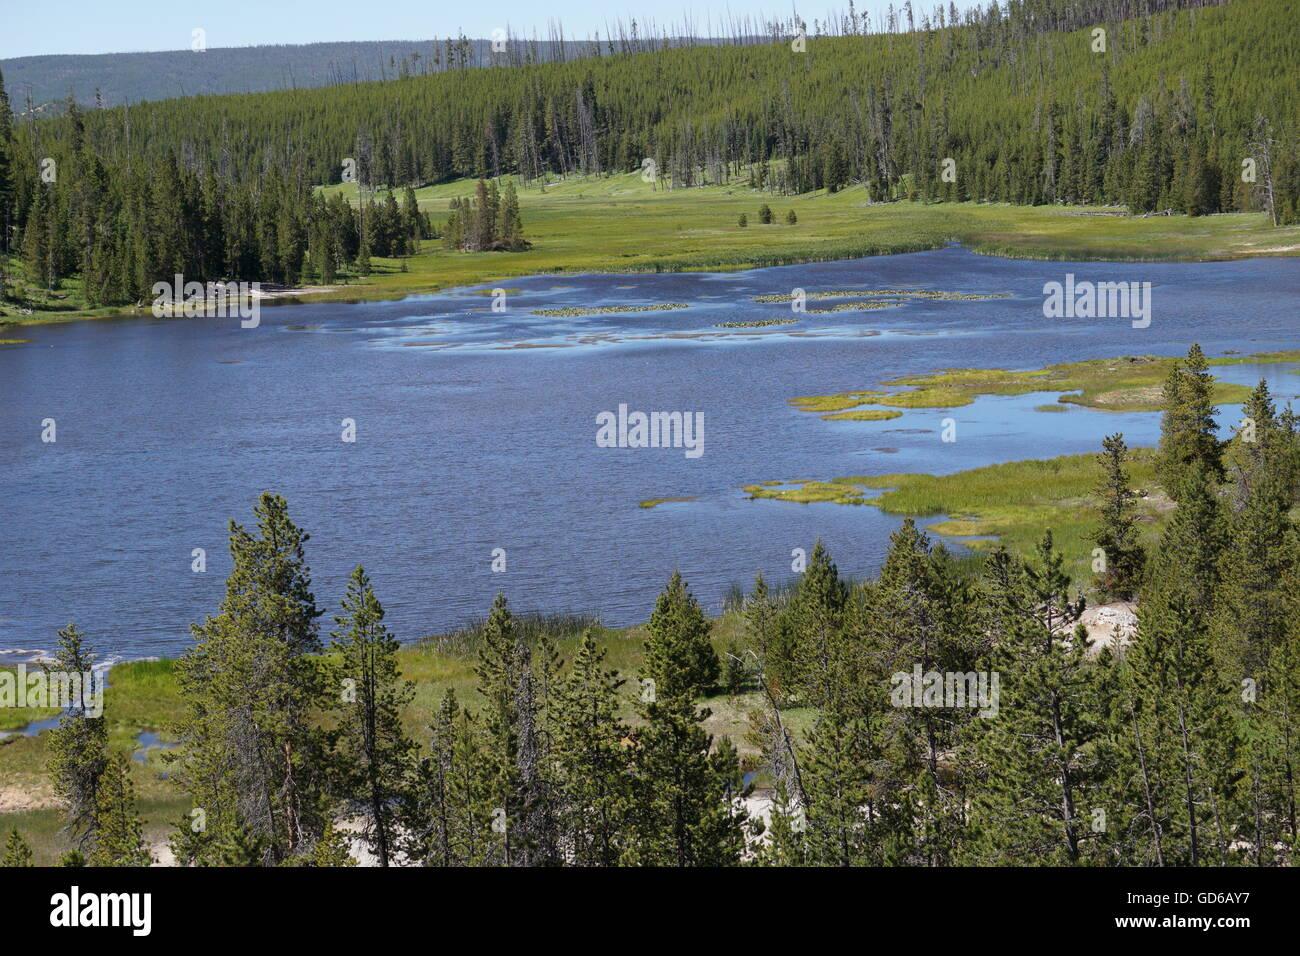 Lago de montaña con lirios de agua amarilla, el Parque Nacional de Yellowstone. Foto de stock